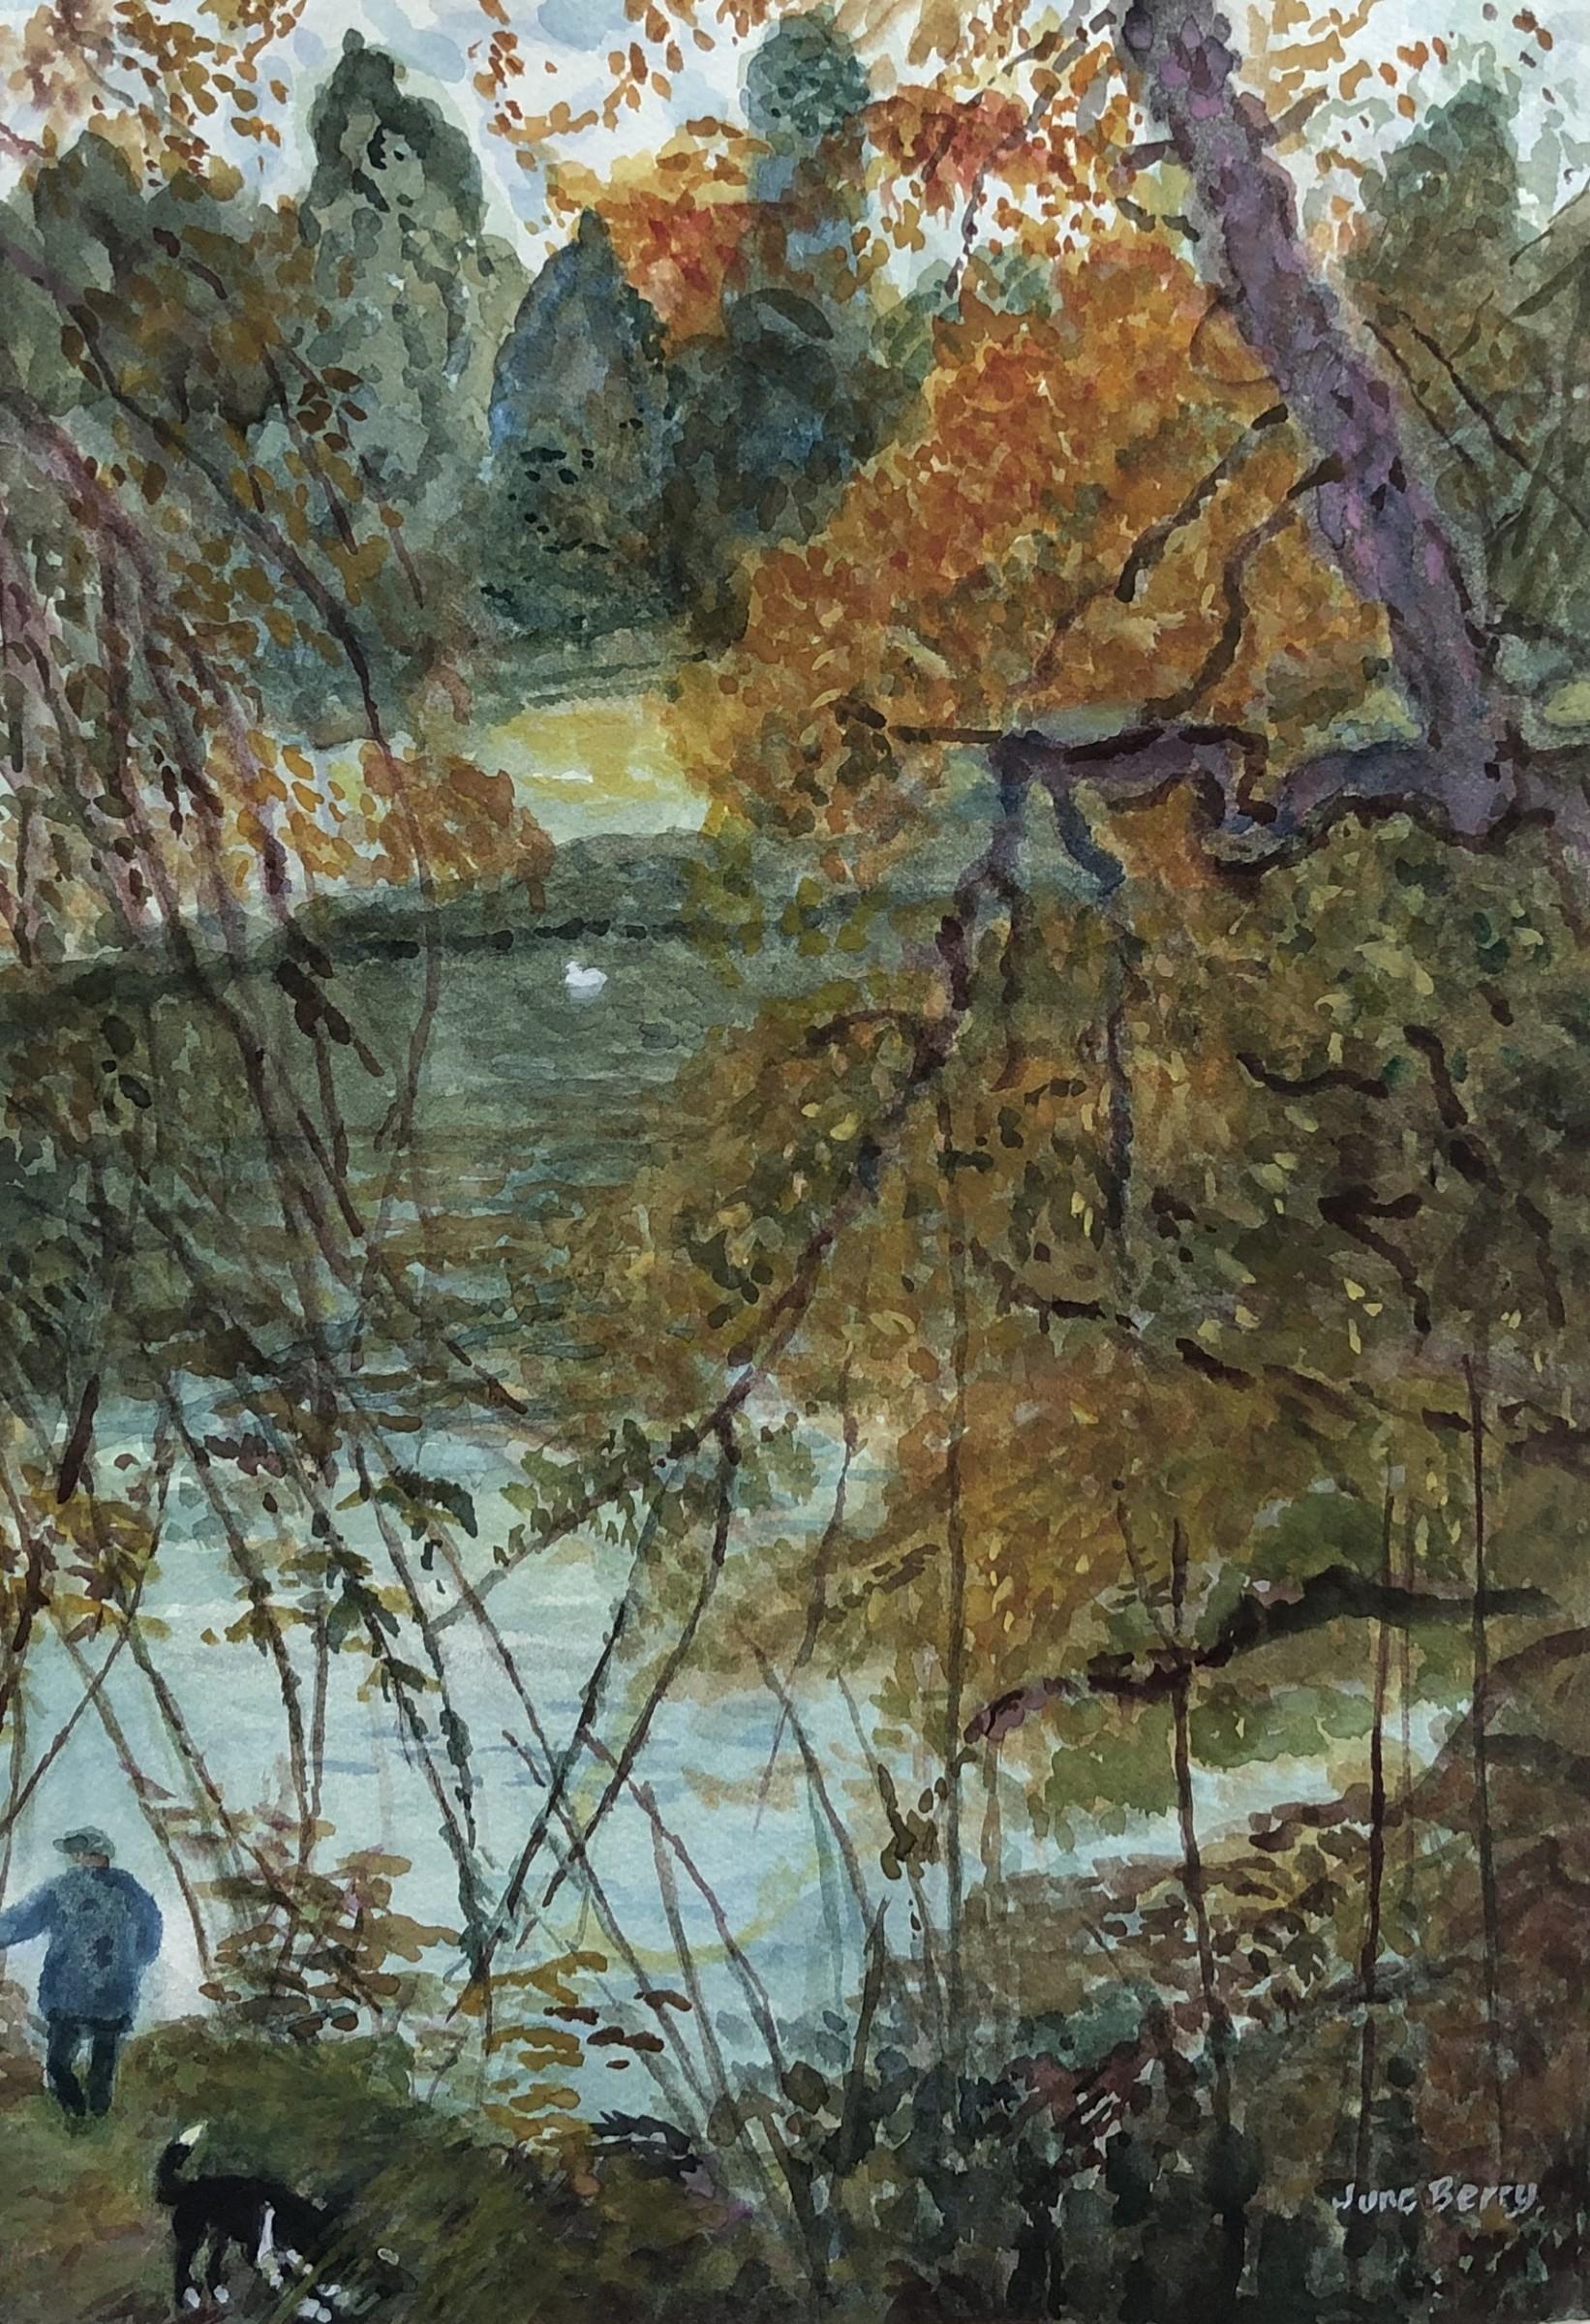 "<span class=""link fancybox-details-link""><a href=""/artists/40-june-berry/works/12016-june-berry-autumn-by-the-lake/"">View Detail Page</a></span><div class=""artist""><span class=""artist""><strong>June Berry</strong></span></div><div class=""title""><em>Autumn by the Lake</em></div><div class=""medium"">watercolour</div><div class=""dimensions"">Frame: 63.5 x 50.8 cm<br /> Artwork: 58.4 x 45.7 cm</div><div class=""price"">£950.00</div>"